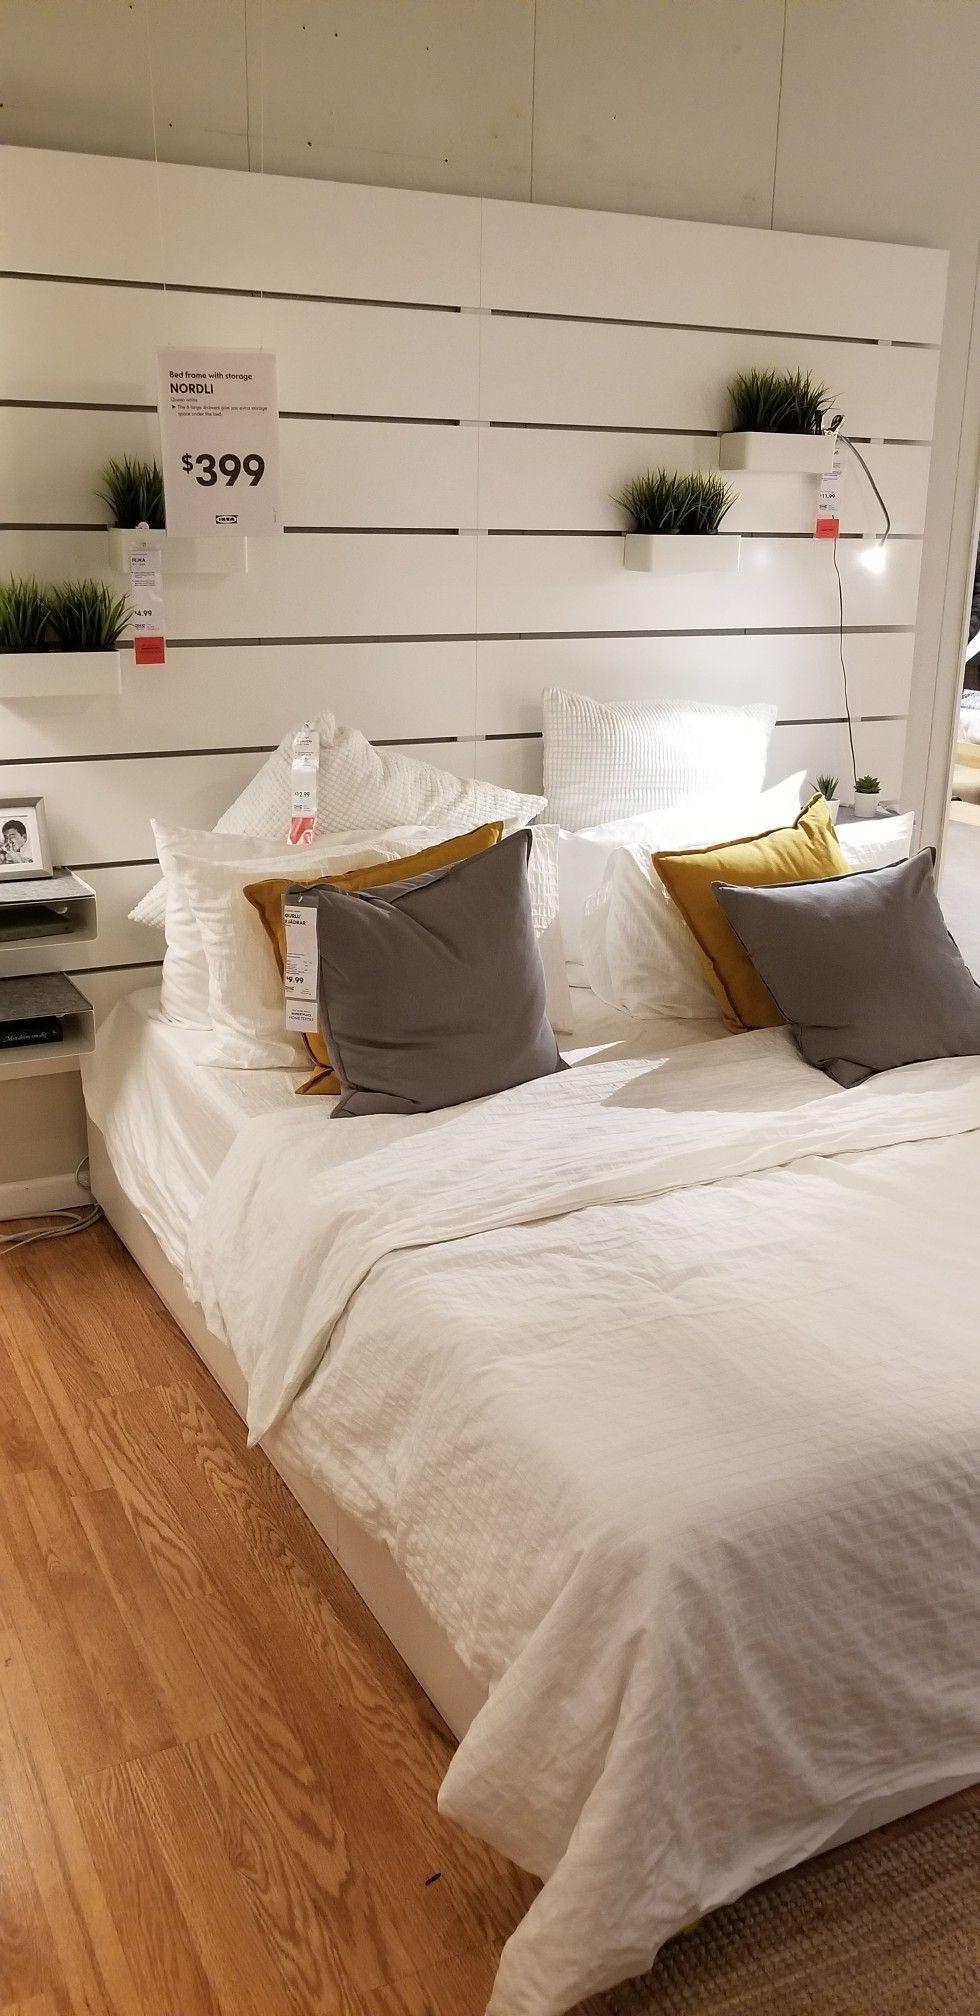 Nordli Headboard 2x Interior Design Bedroom Small Bedroom Closet Design Ikea Bed